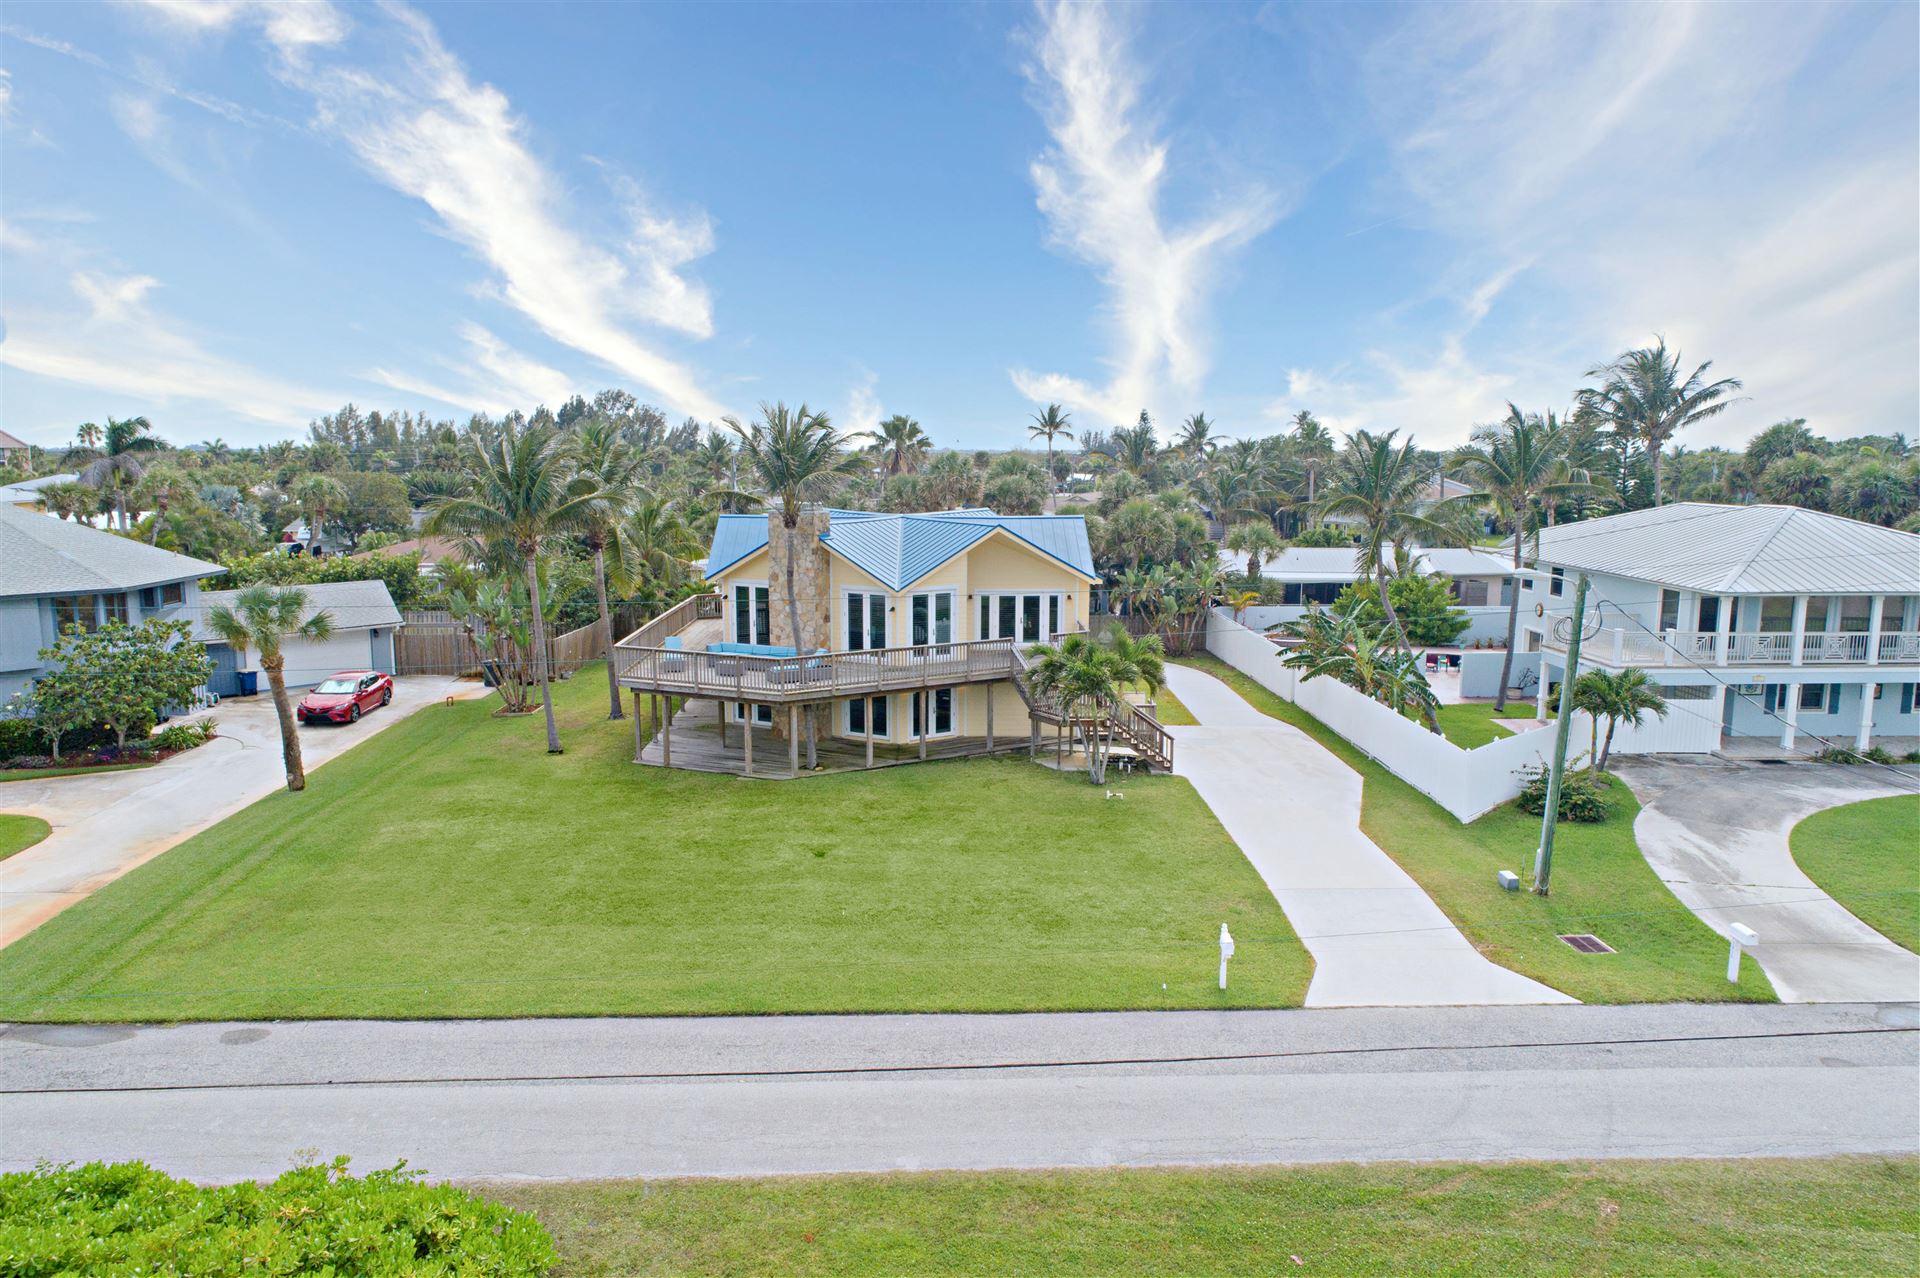 1913 Surfside Drive, Fort Pierce, FL 34949 - #: RX-10713087